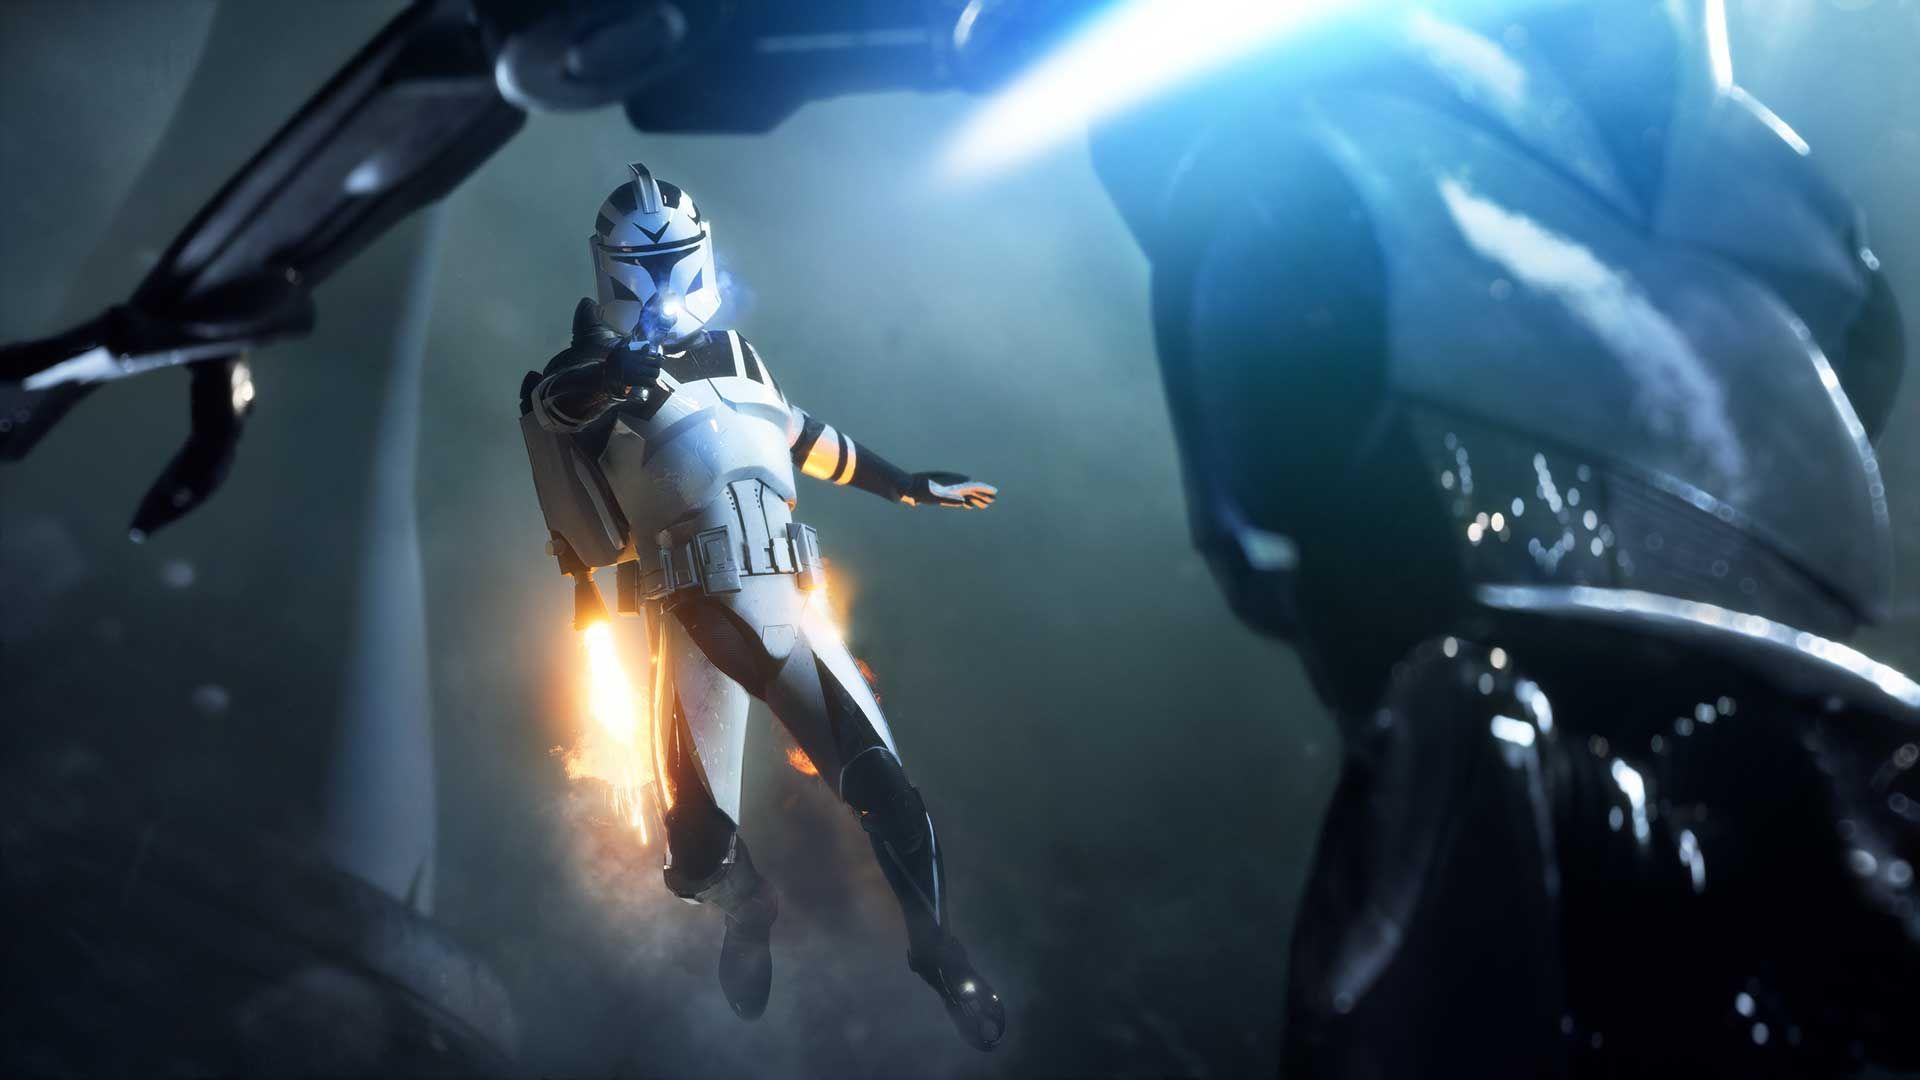 star wars battlefront ii customisation and clone wars dlc confirmed